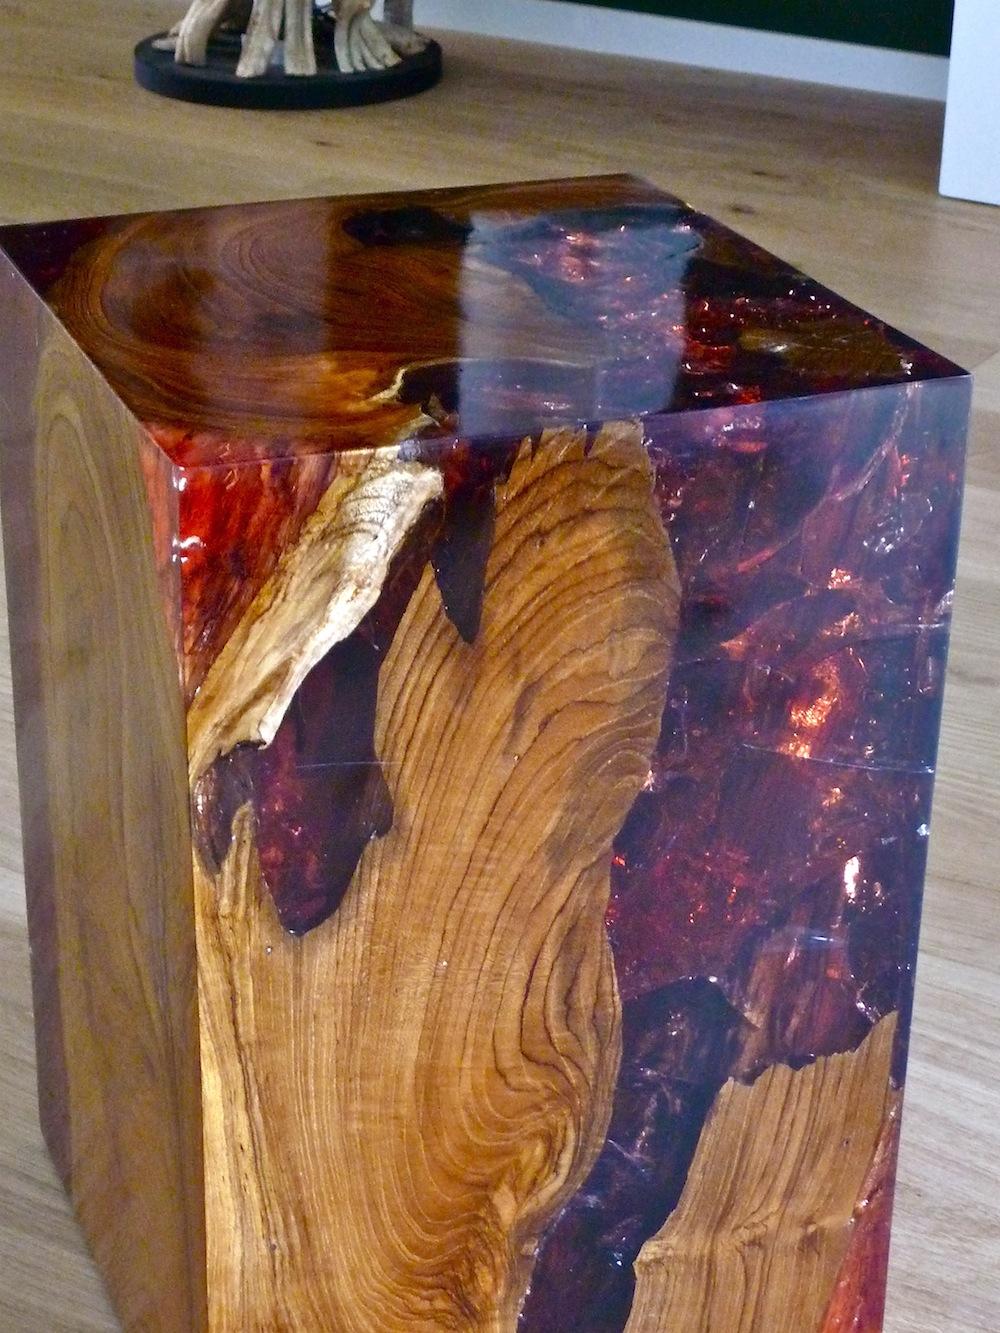 hocker holz teak wurzel m kunstharz resin podest s ule beistelltisch quader ebay. Black Bedroom Furniture Sets. Home Design Ideas